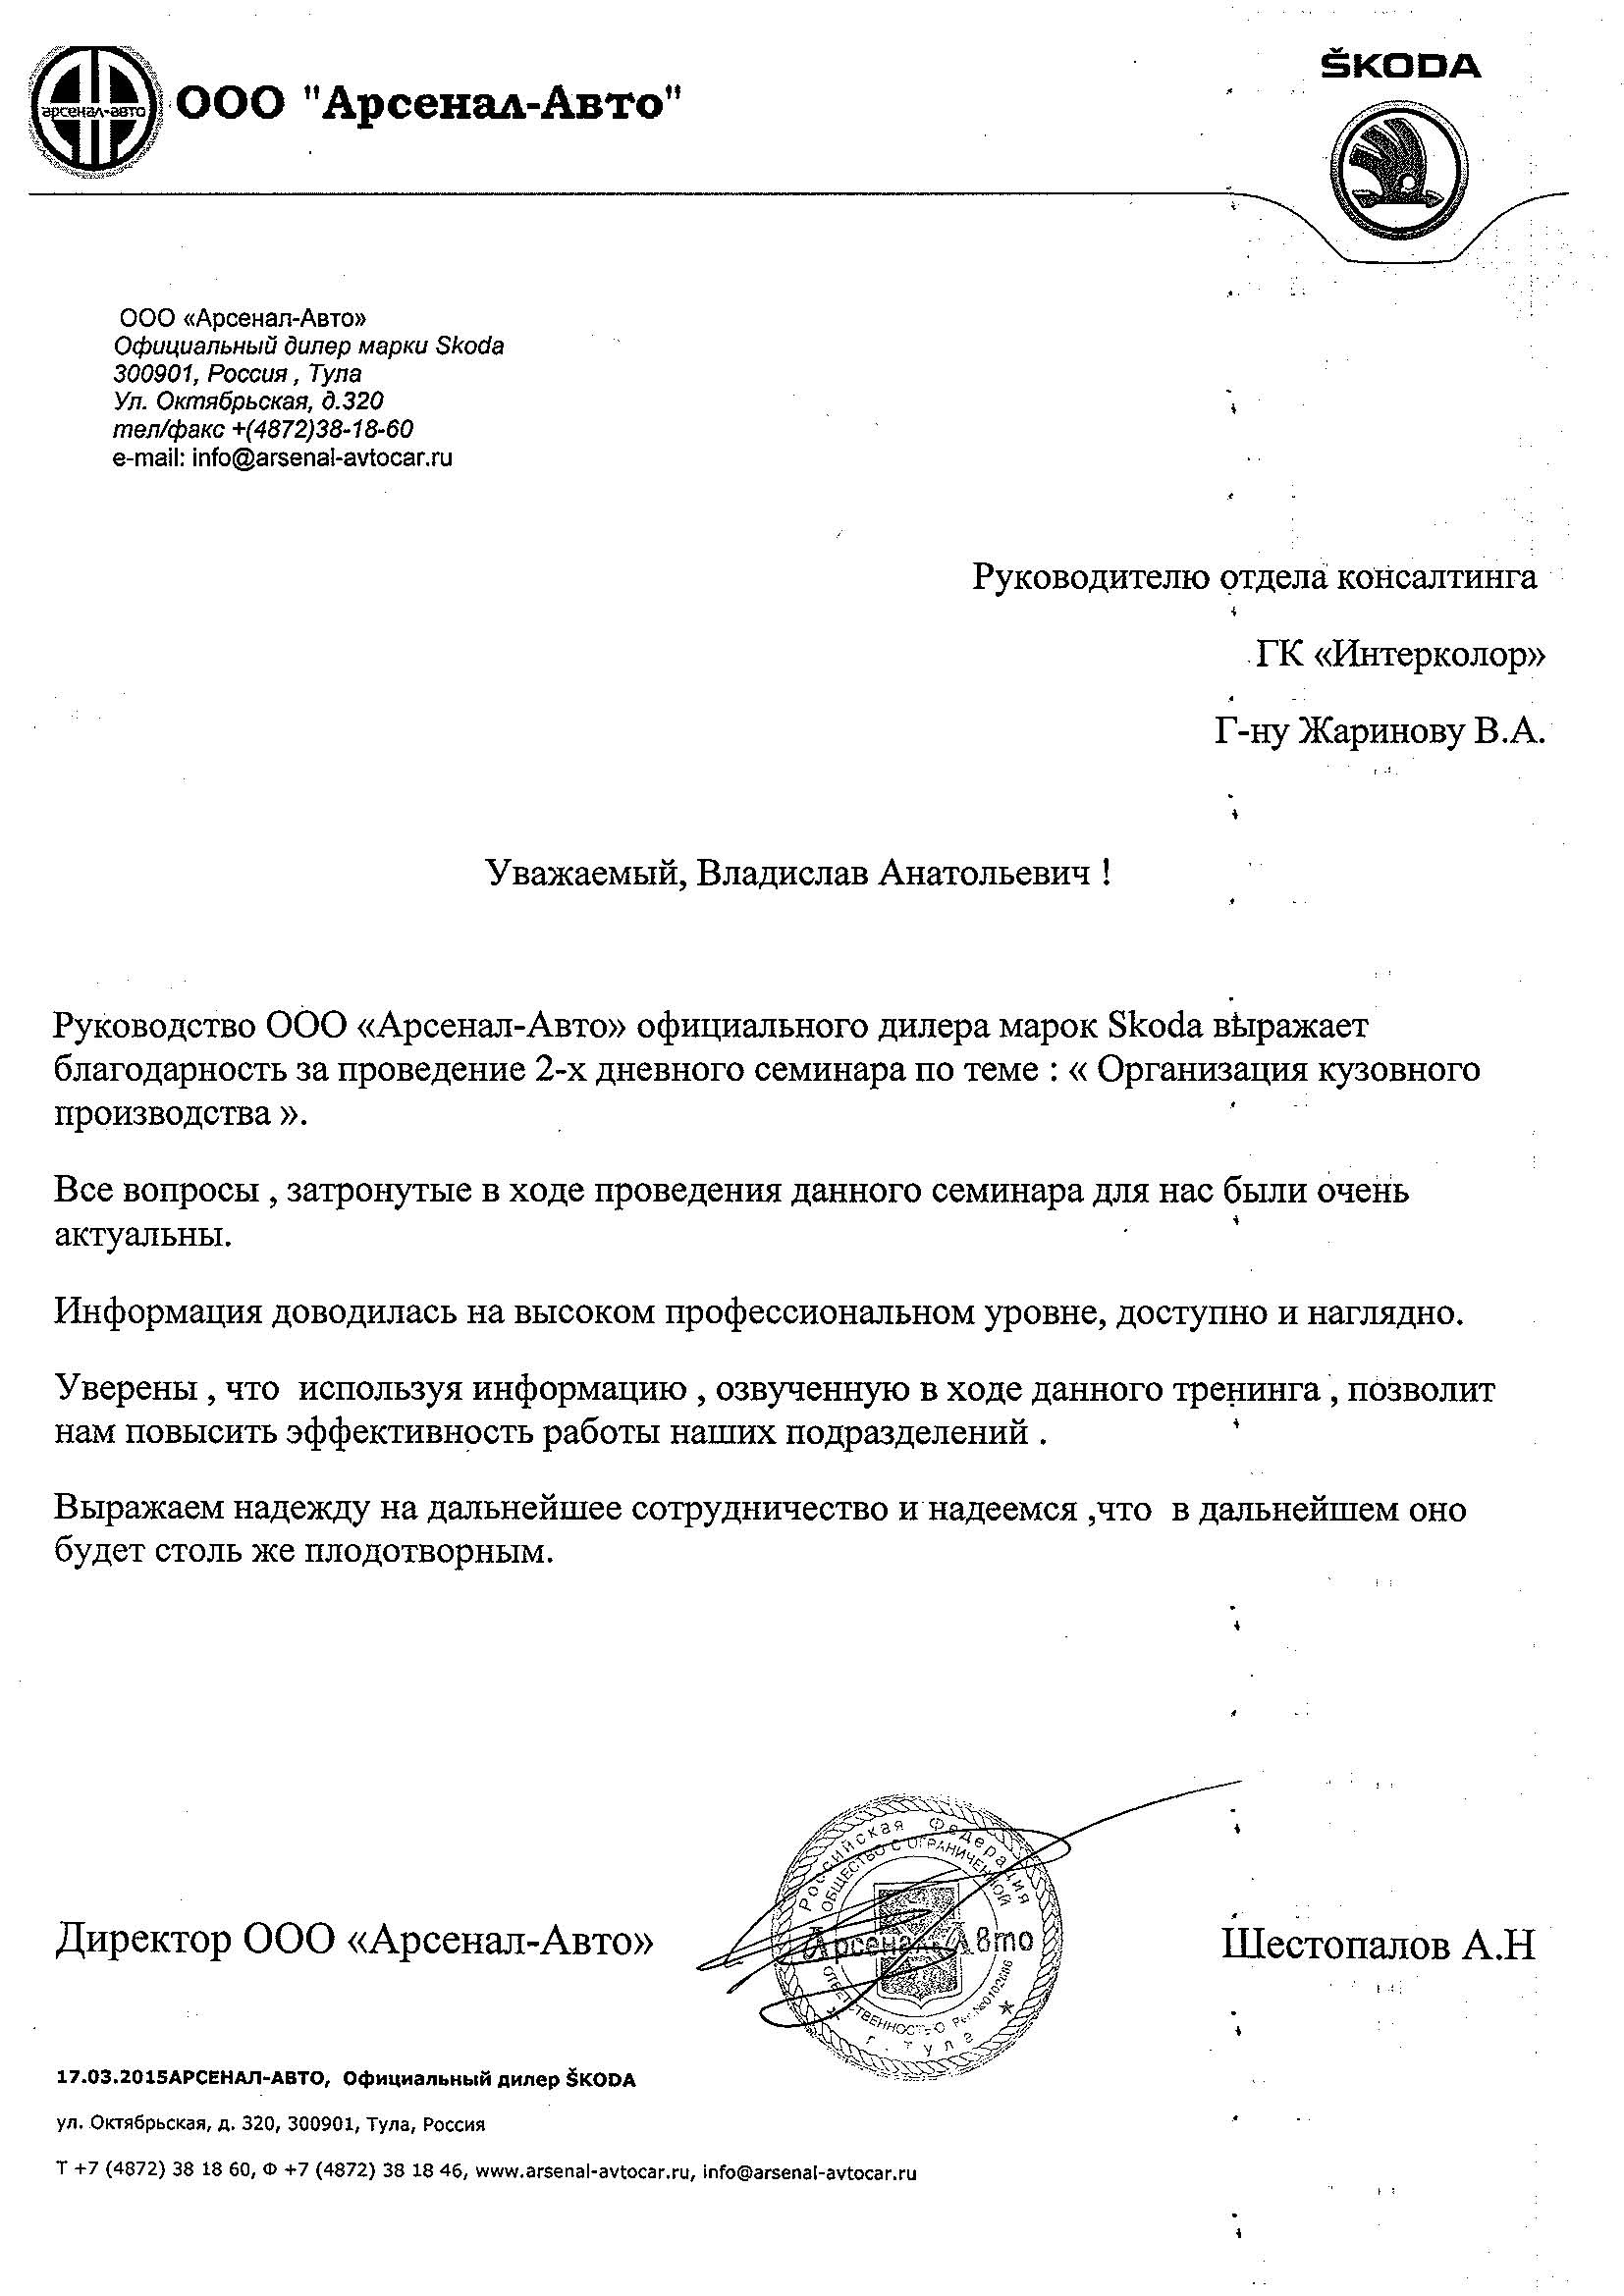 ООО Арсенал-Авто, г.Тула